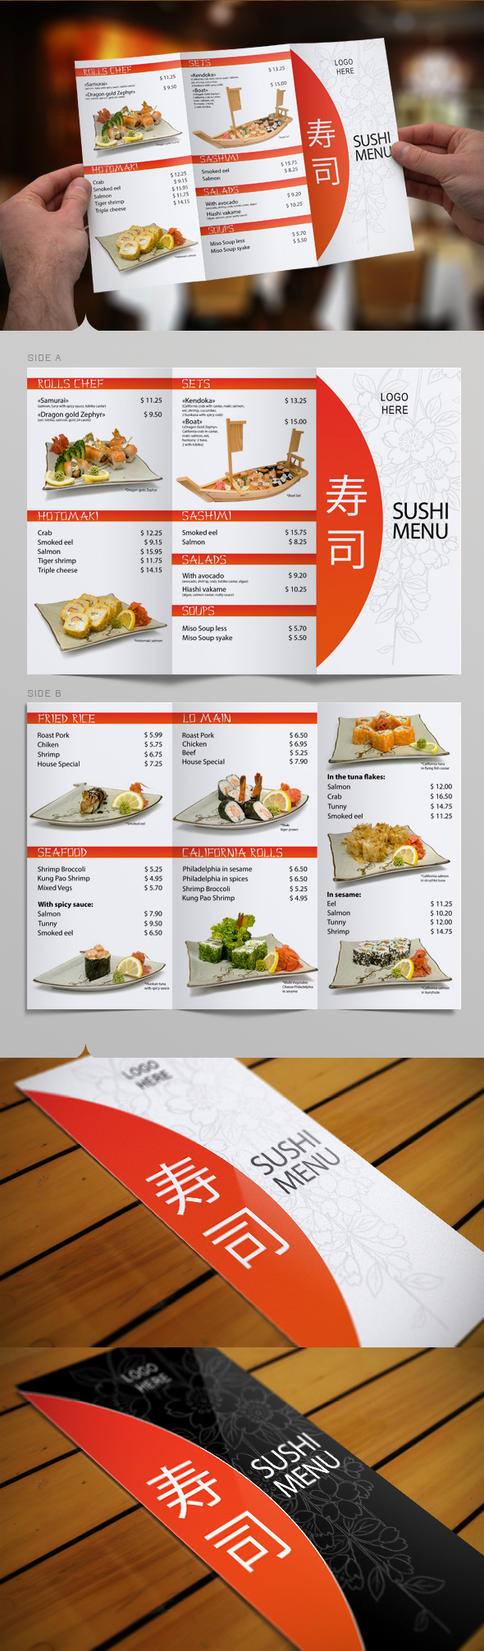 Template Psd Menu Restaurant Free